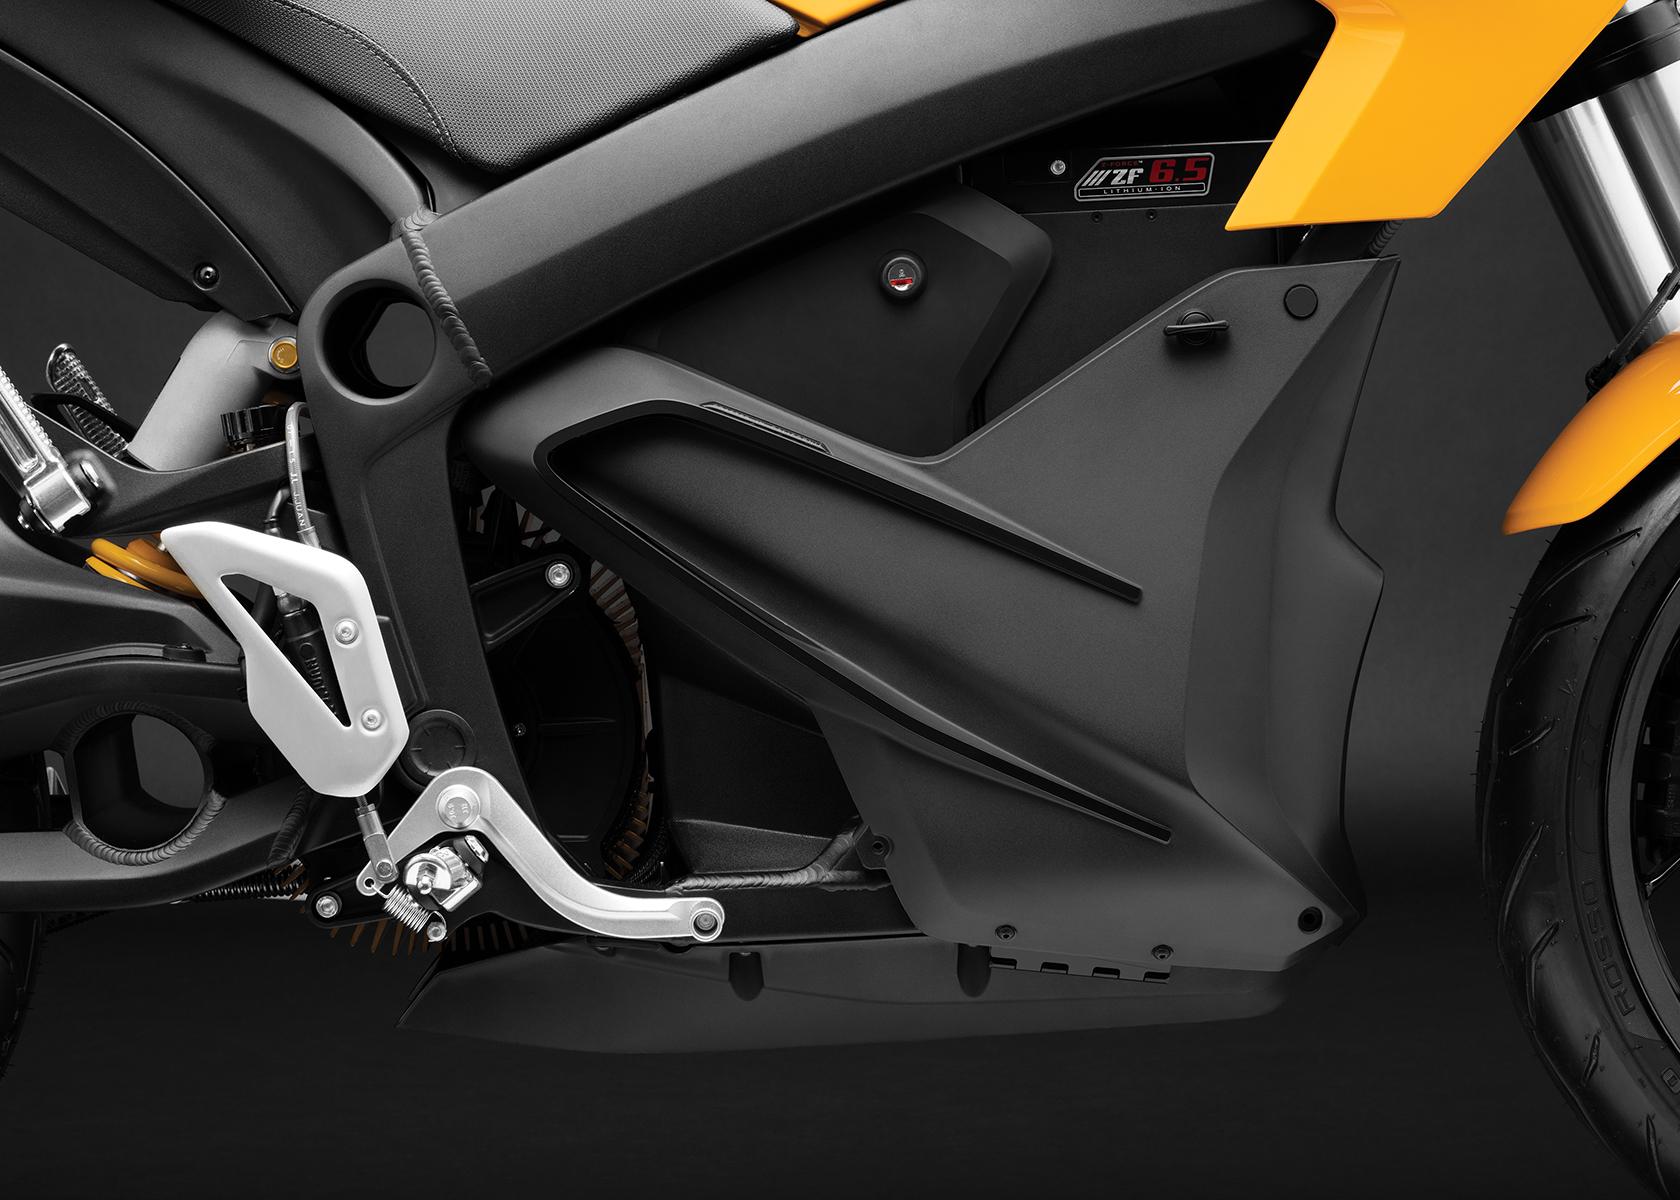 2017 Zero S ZF6.5 Electric Motorcycle: Storage